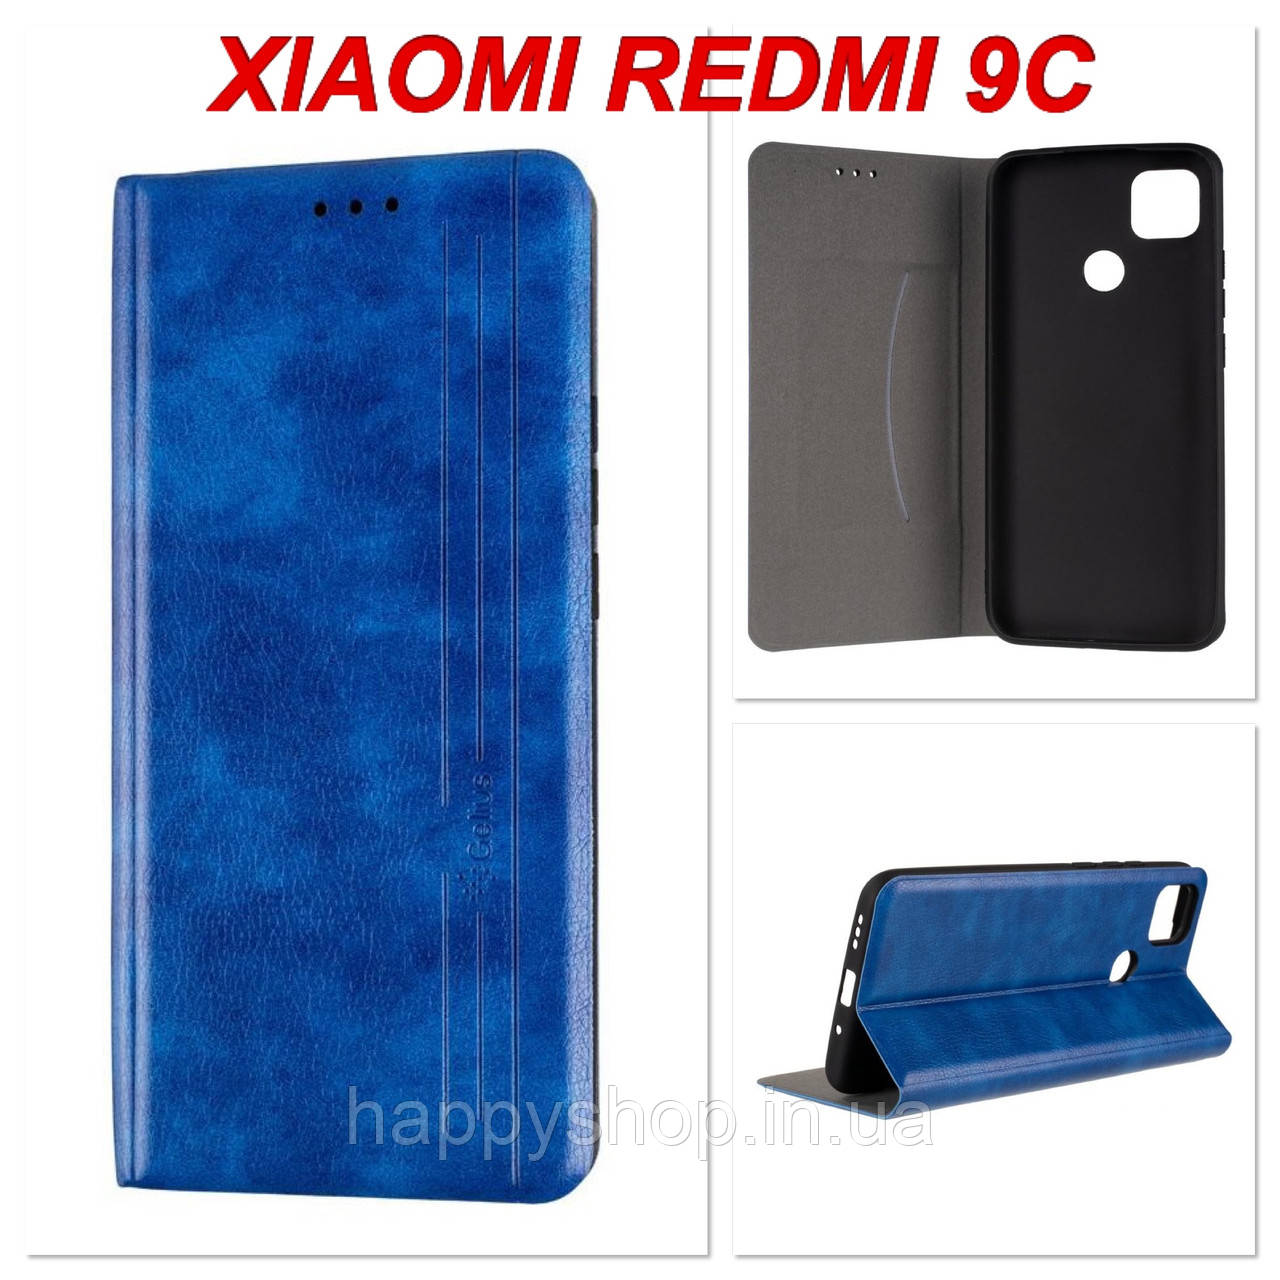 Чехол-книжка Gelius Leather New для Xiaomi Redmi 9C (Синий)